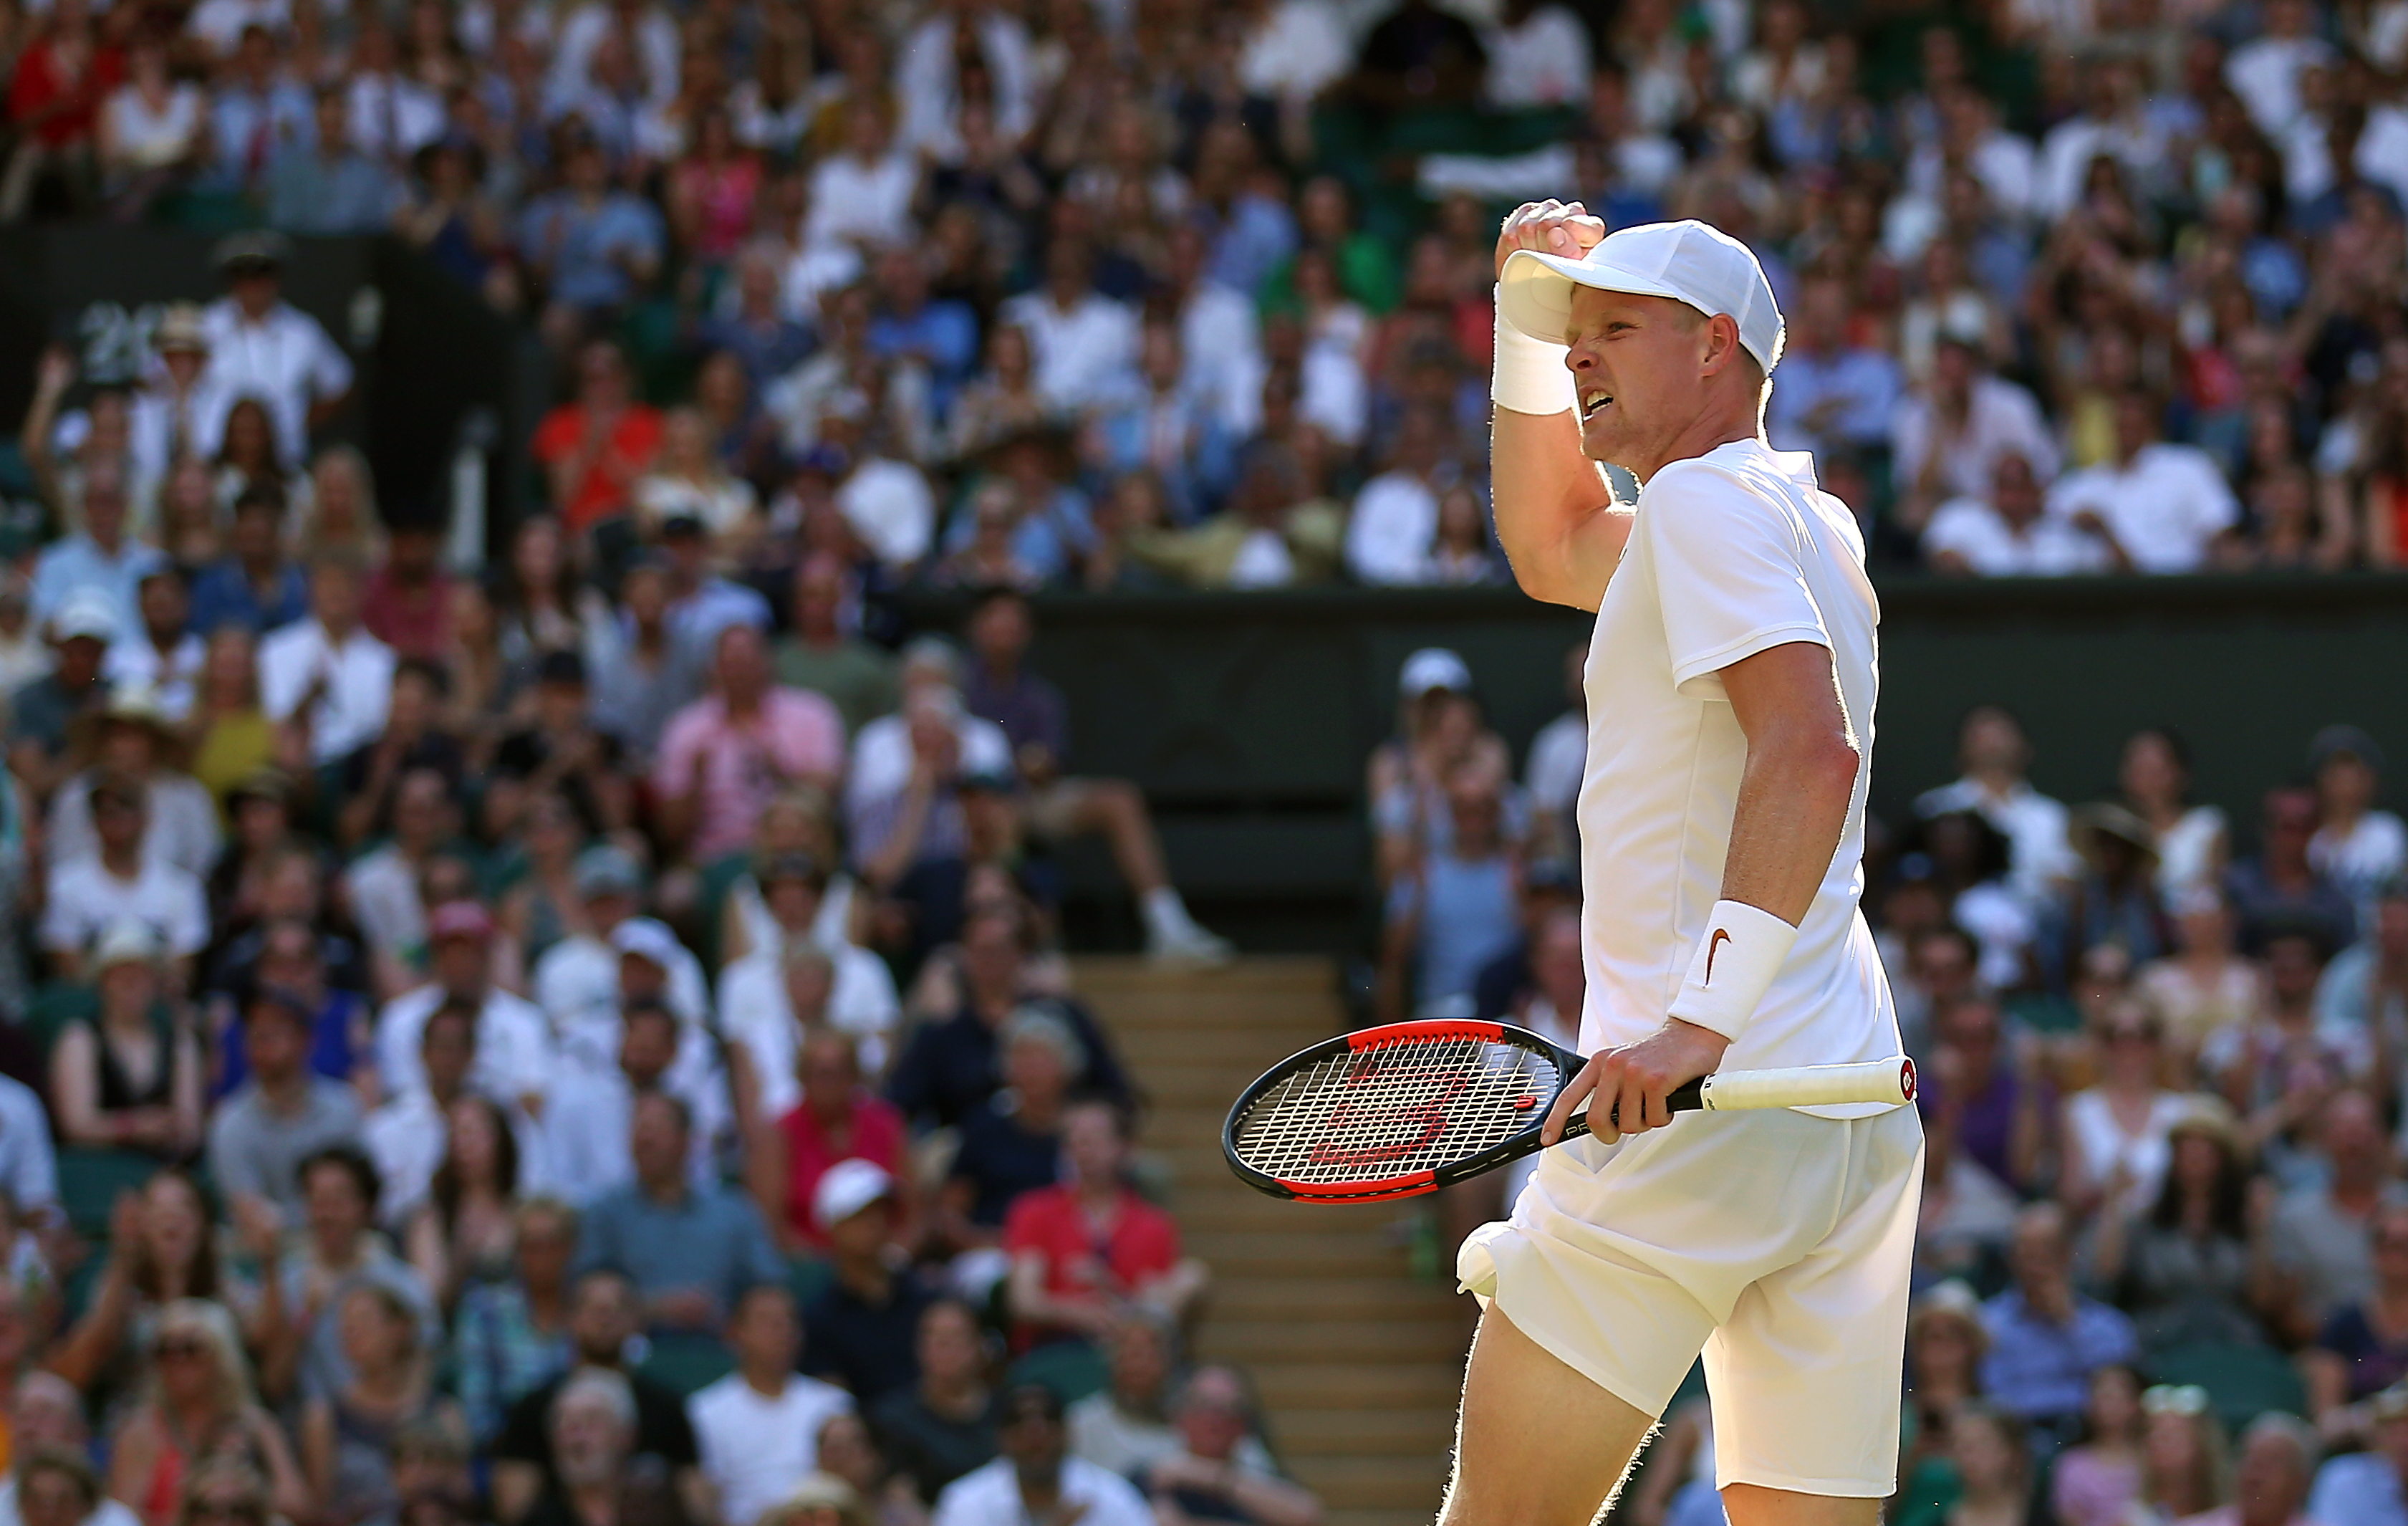 Edmund pumps his fist at last summer's Wimbledon. Image: PA Images